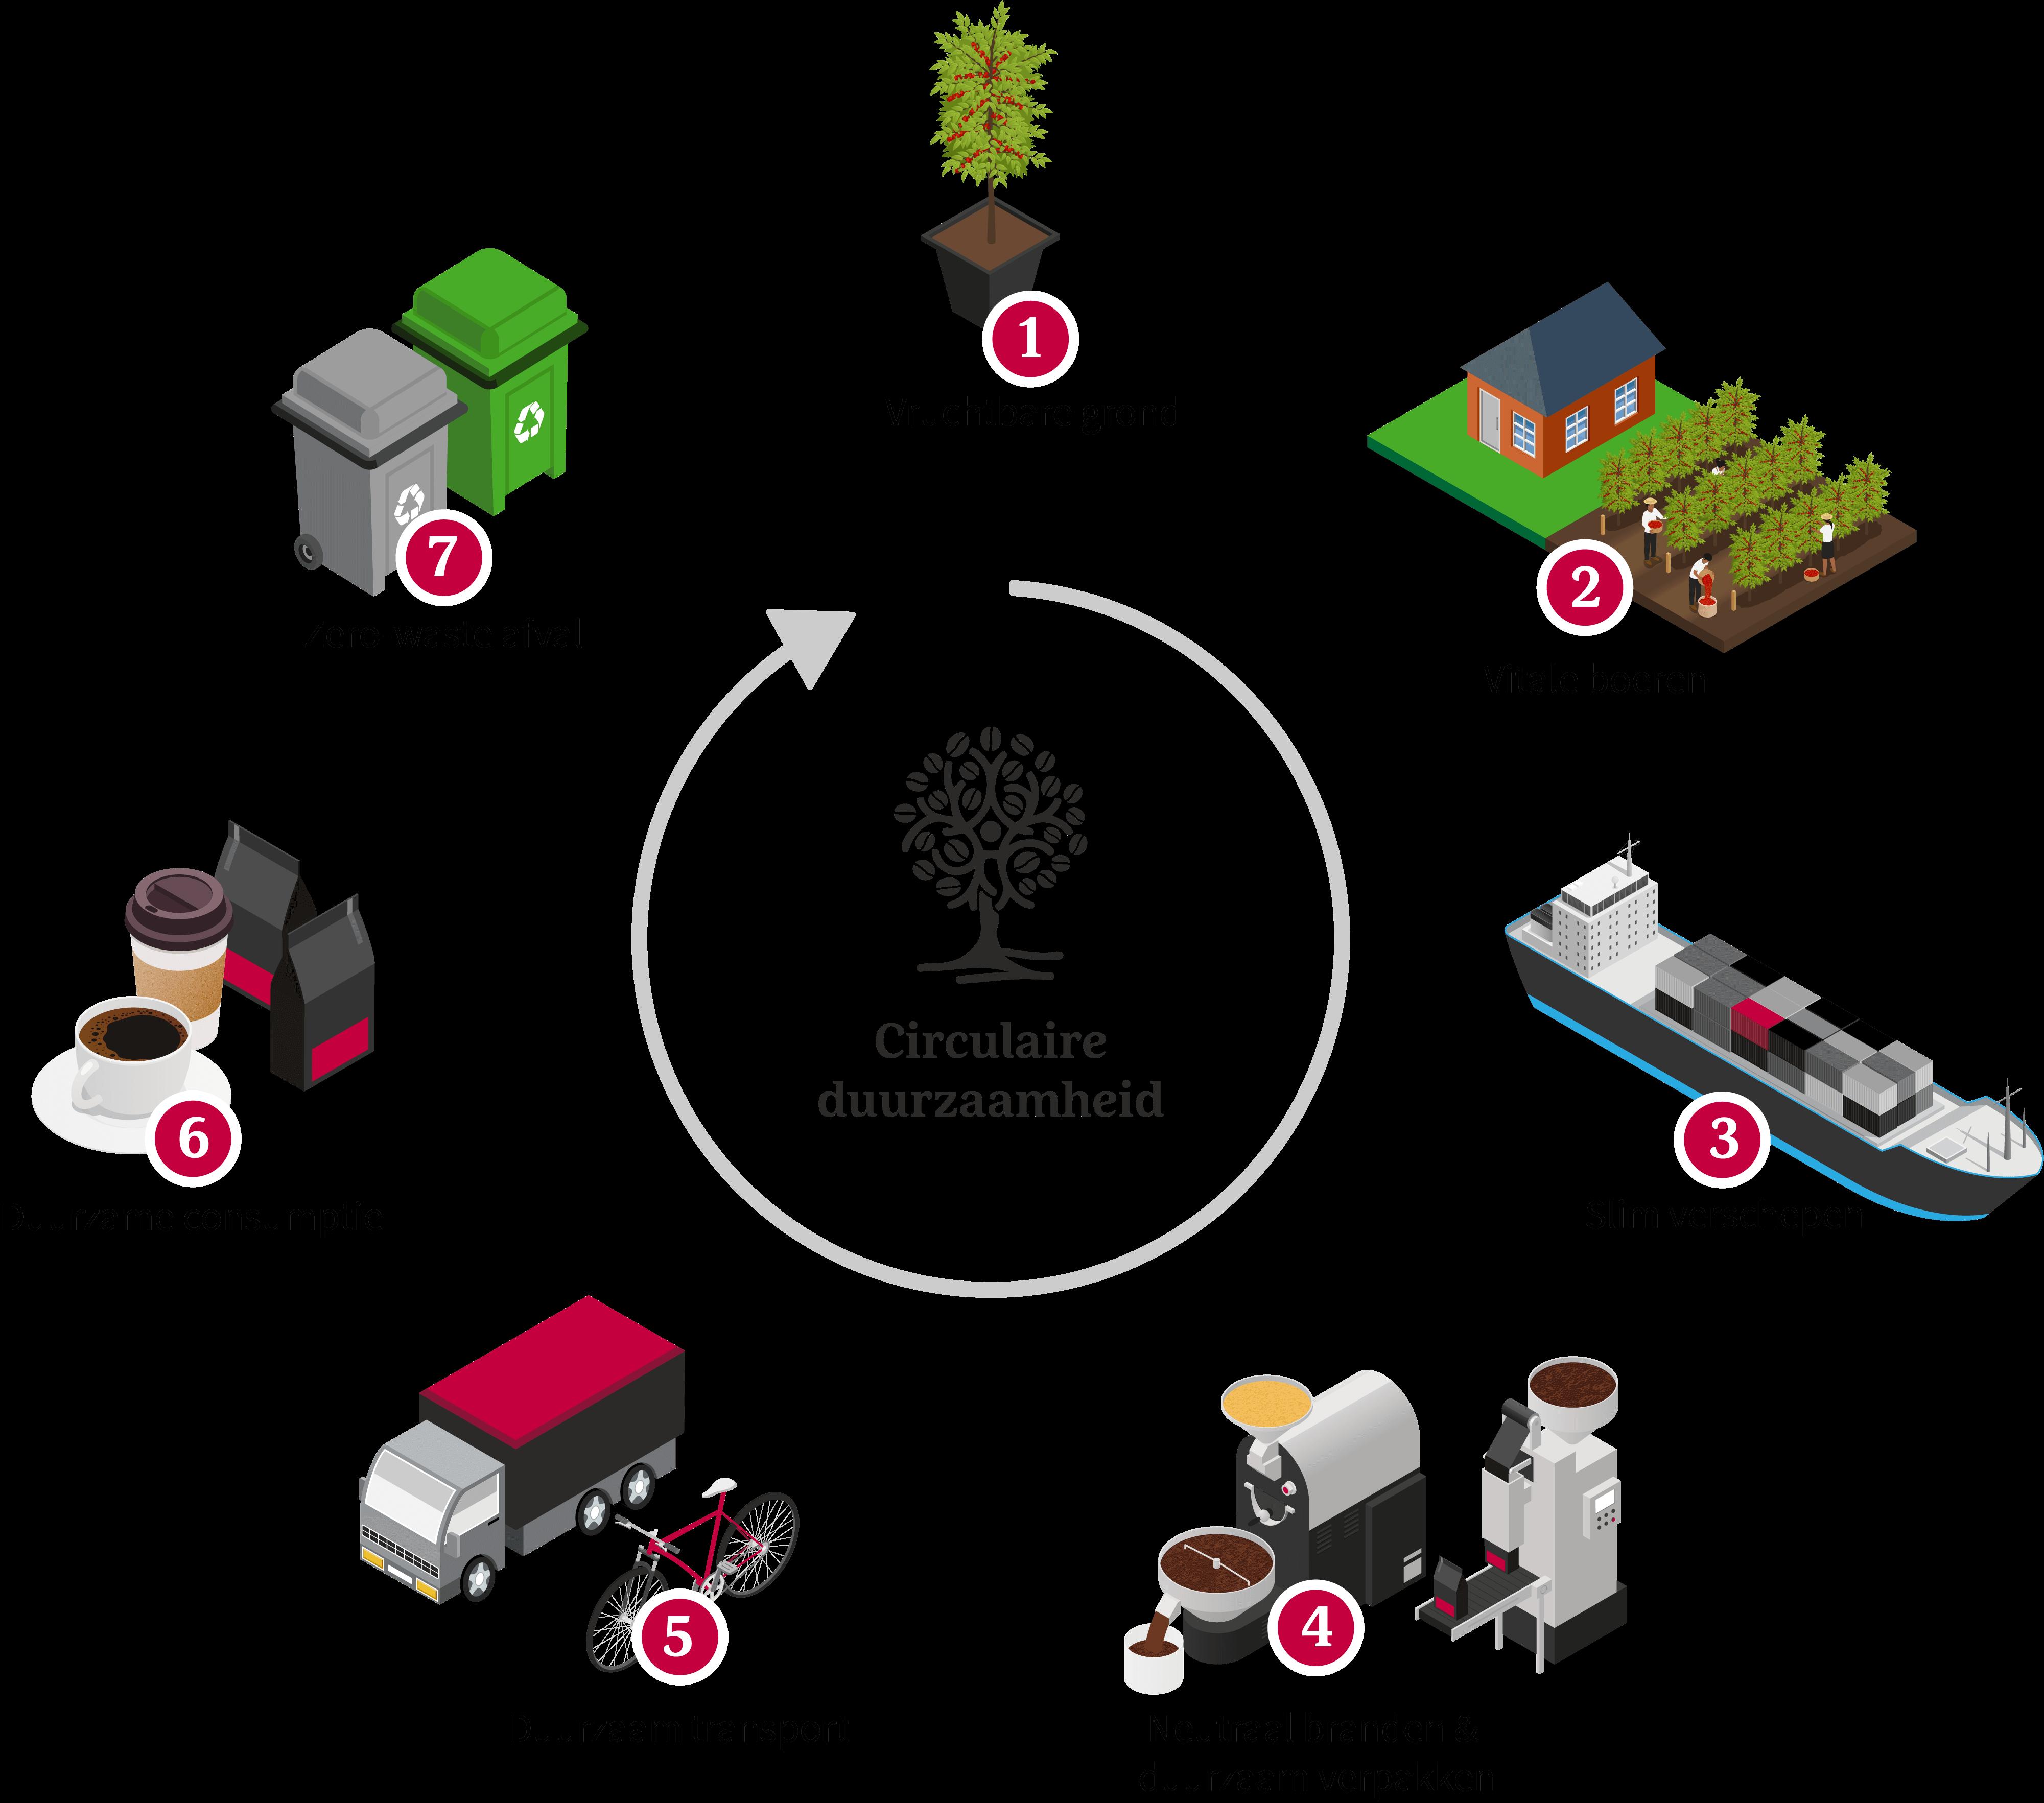 Aroma Club duurzaamheid cyclus